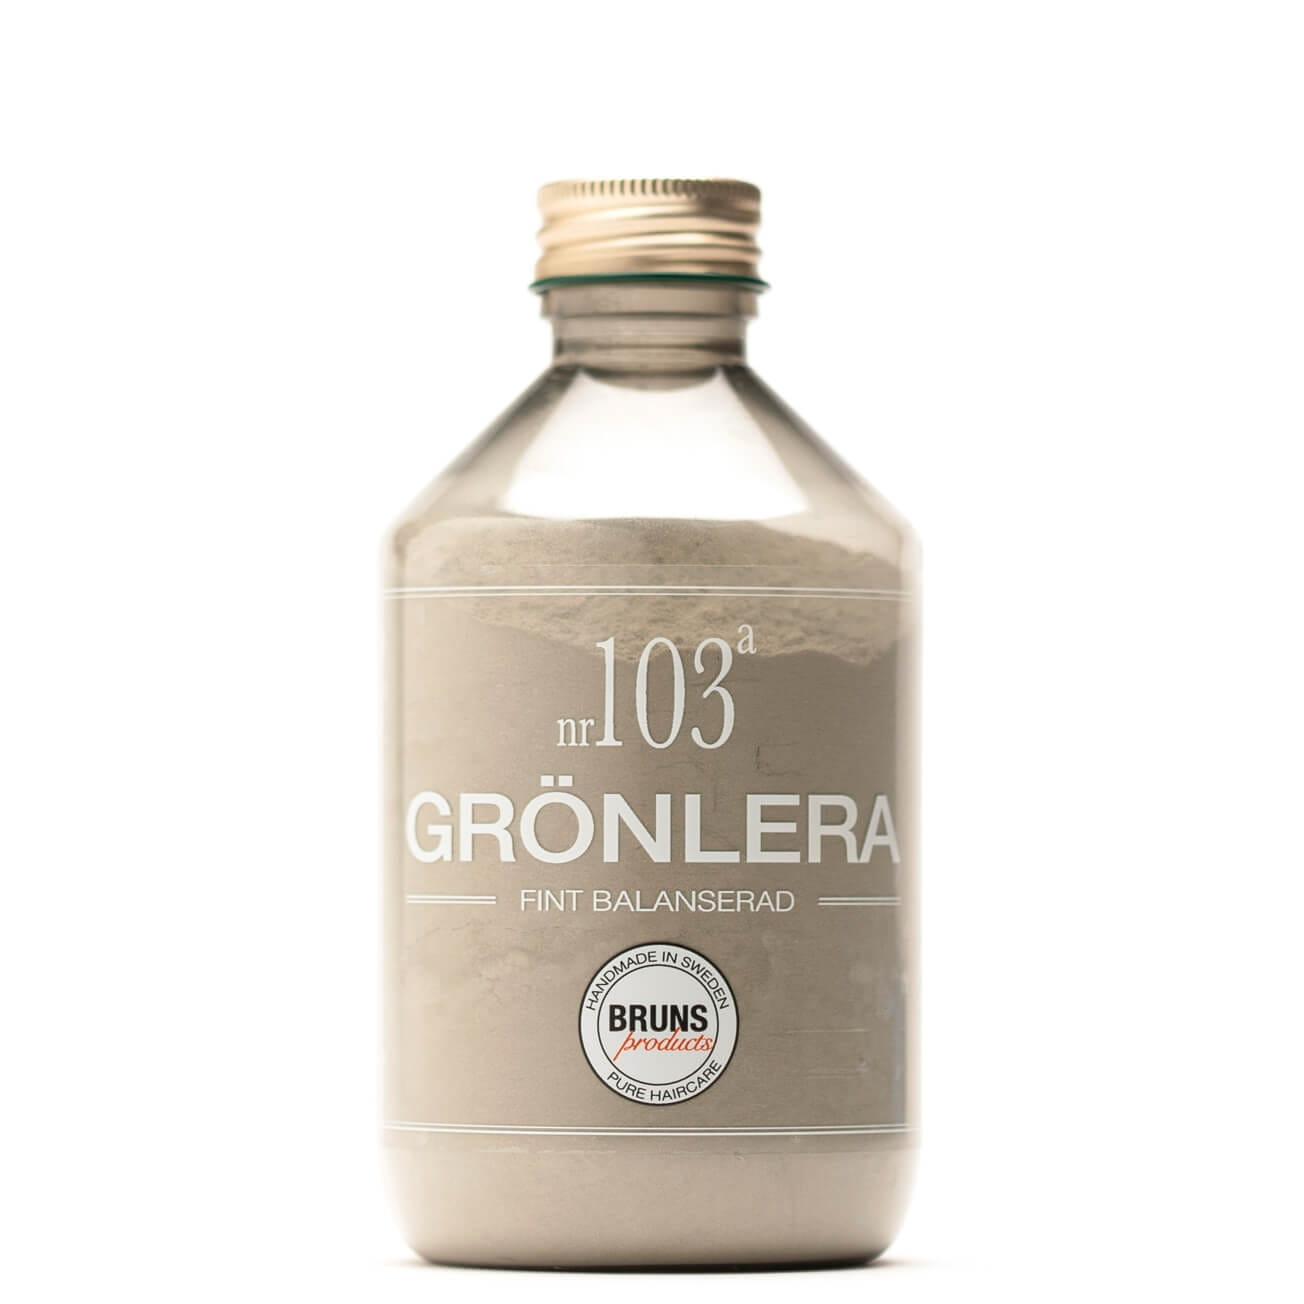 Bruns Products Grönlera 103a SPA, 300gr - Fint balanserad